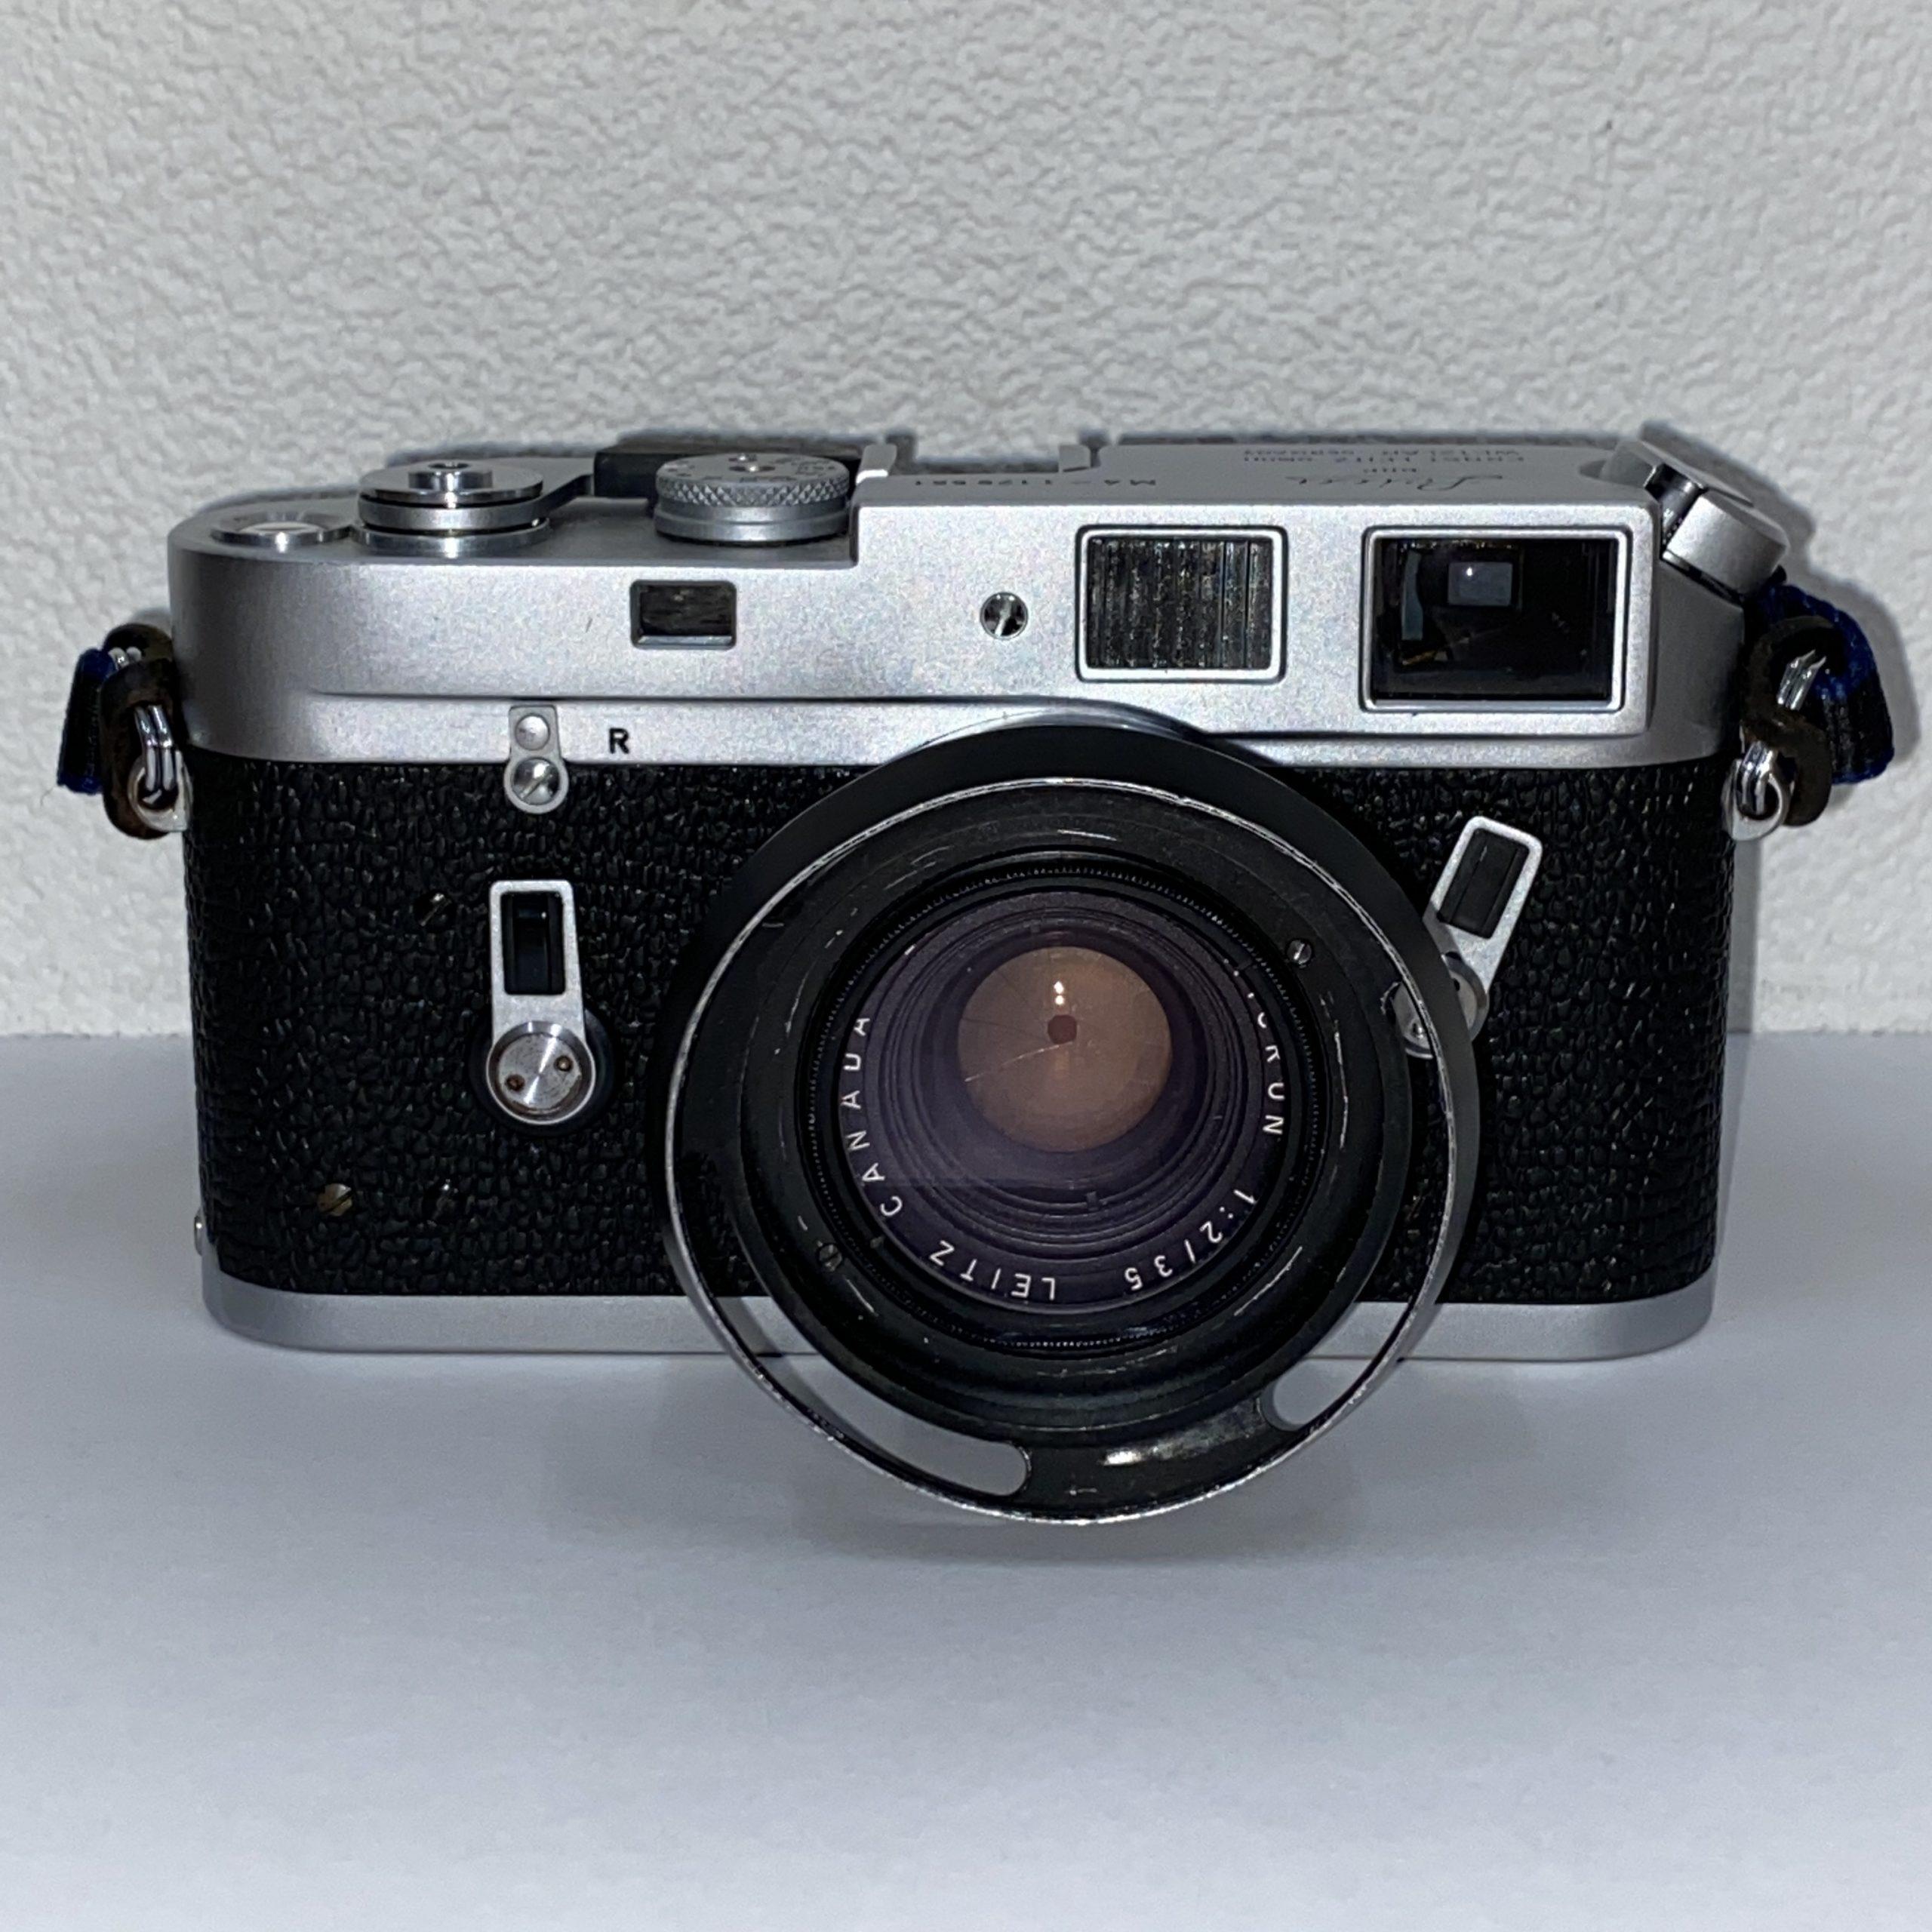 【Leica/ライカ】M4 ERNST LEITZ GMBH/WETZLAR GERMANY レンジファインダーカメラ レンズ SUMMICRON 1:2/35